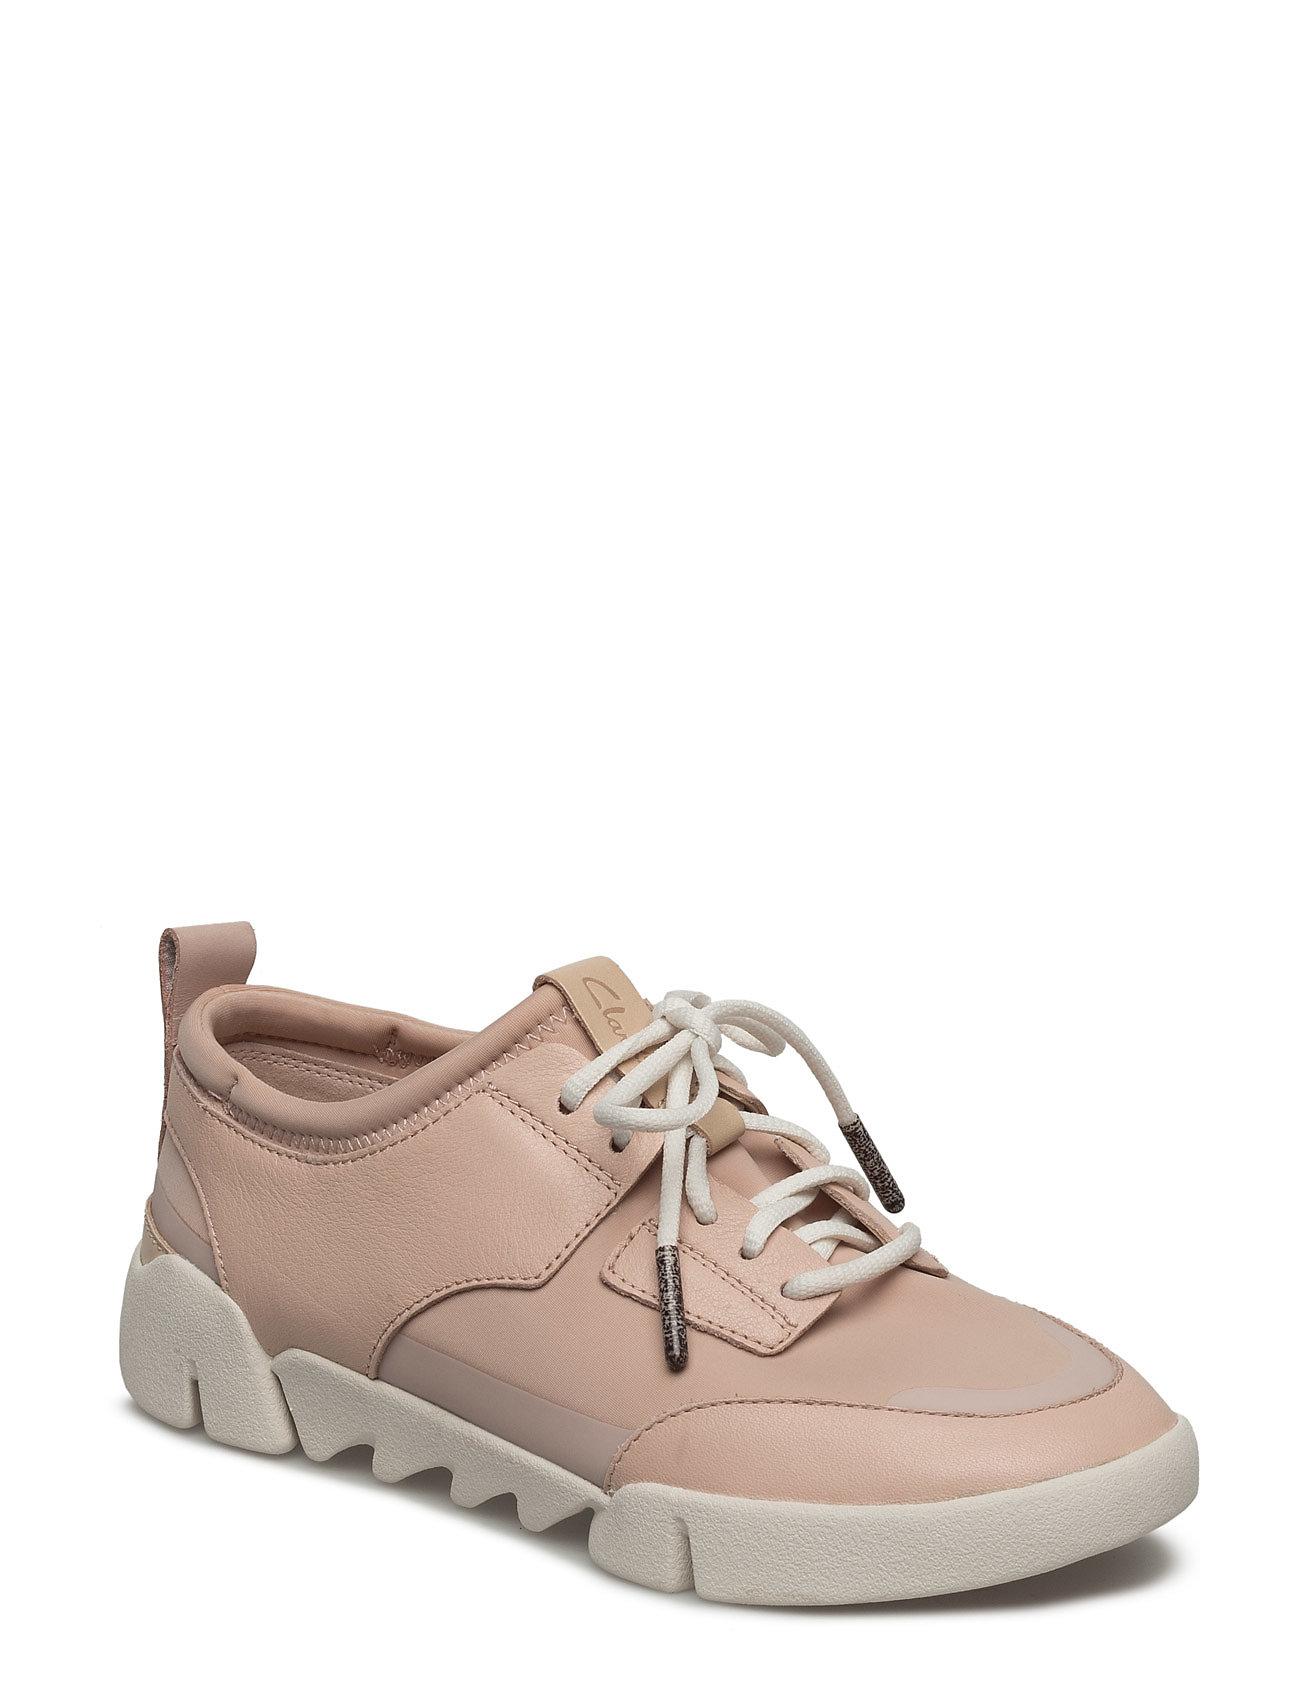 Tri Soul Clarks Sneakers til Damer i